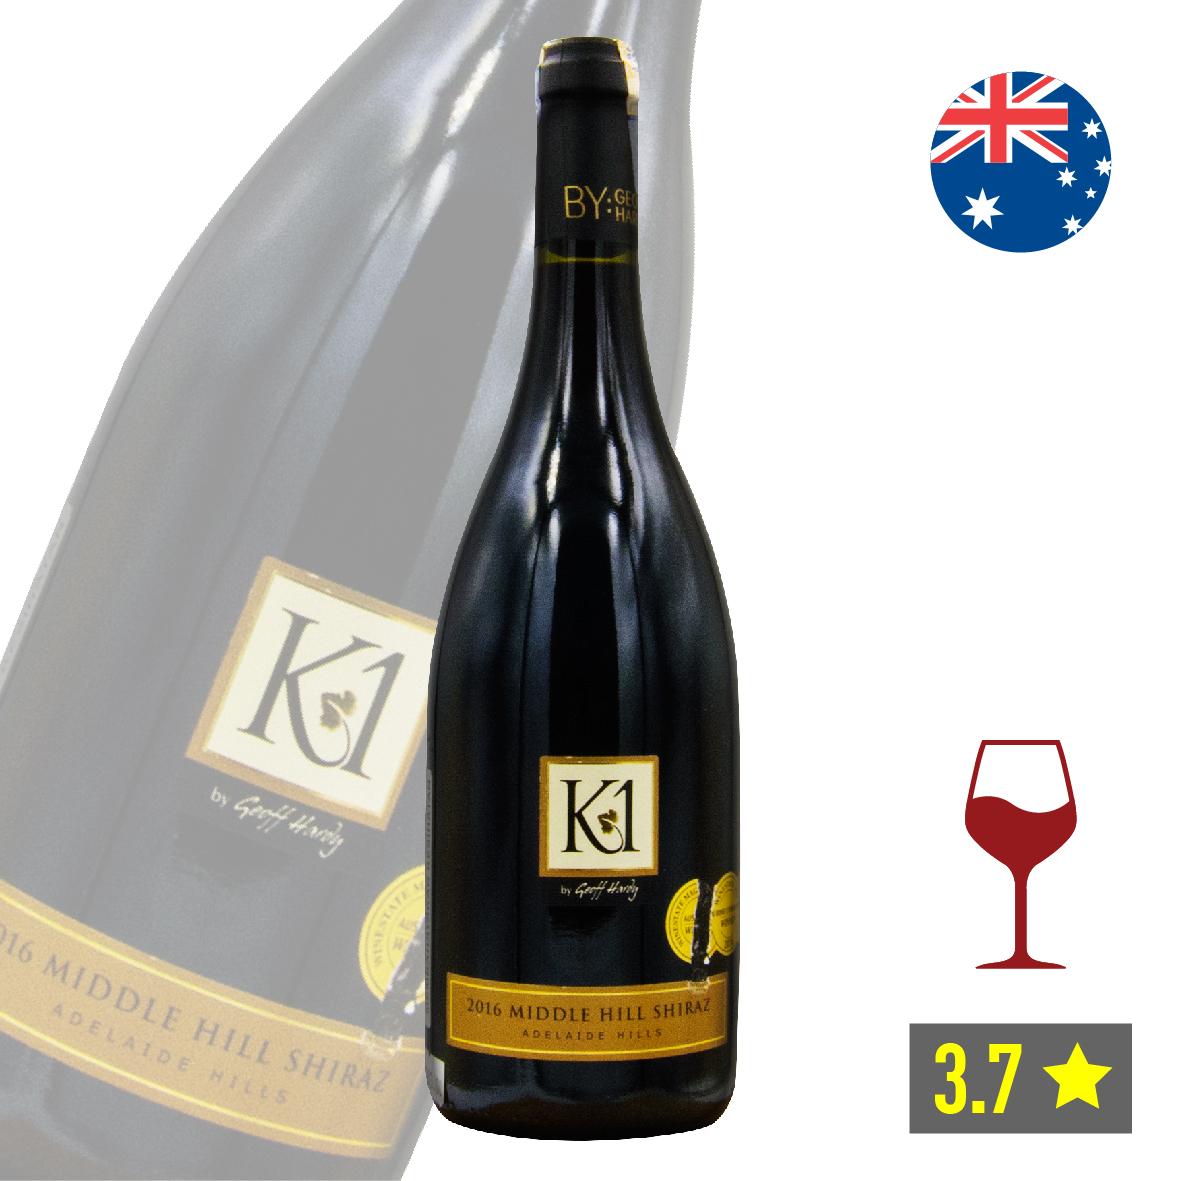 11-GEOFF HARDY K1 MIDDLE HILL SHIRAZ 2016-Australia-01.jpg